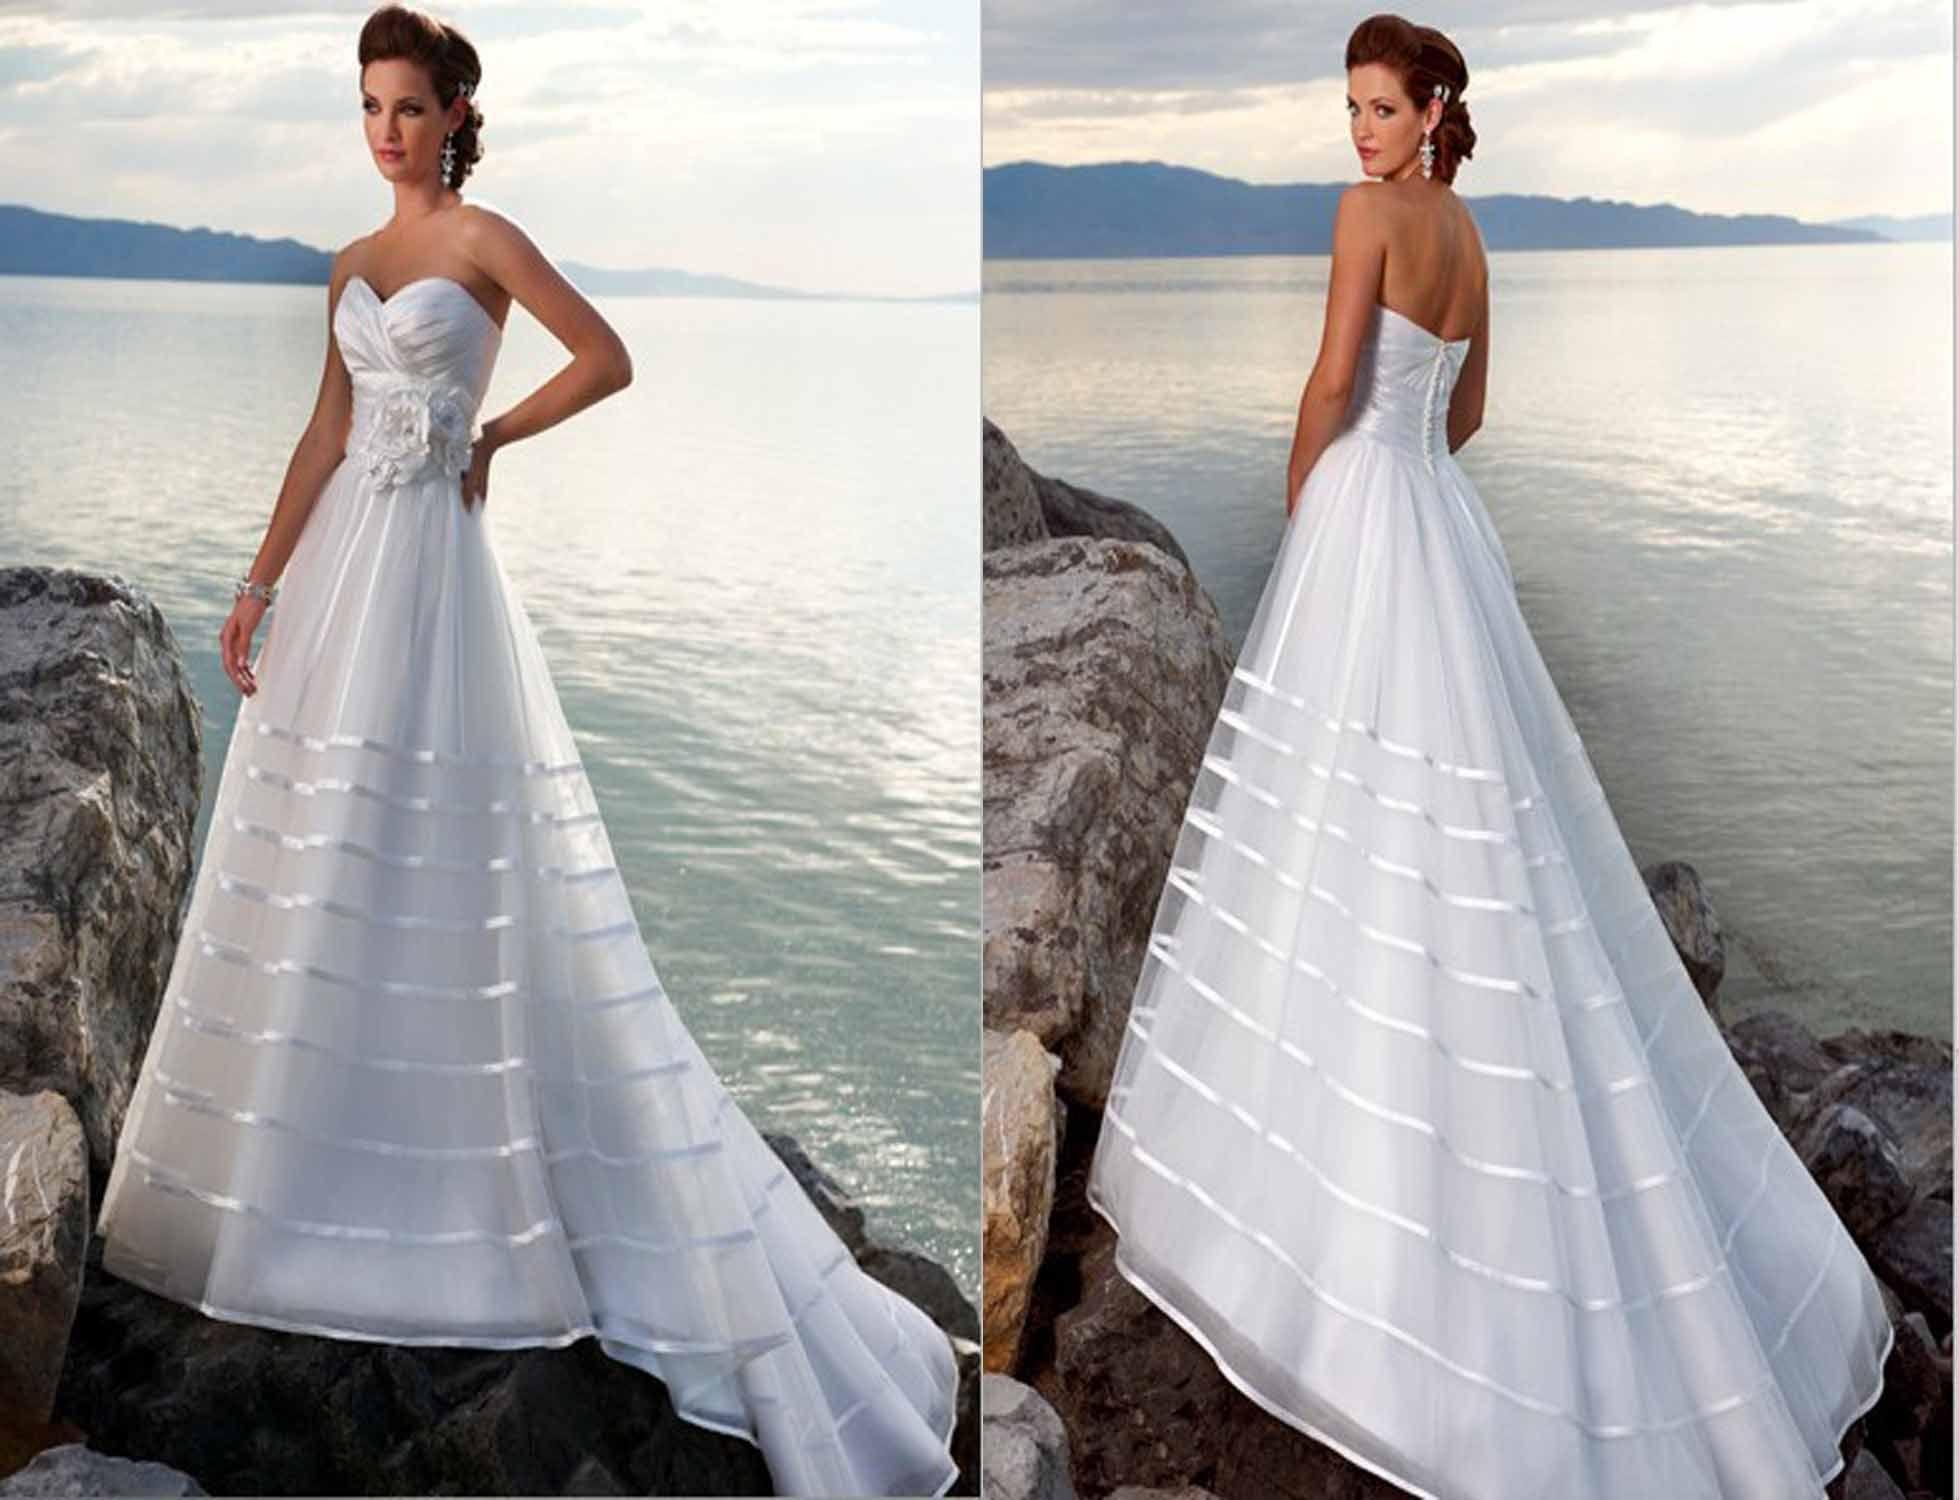 Wedding Dress Ideas: Light And Flowy Wedding Dresses For